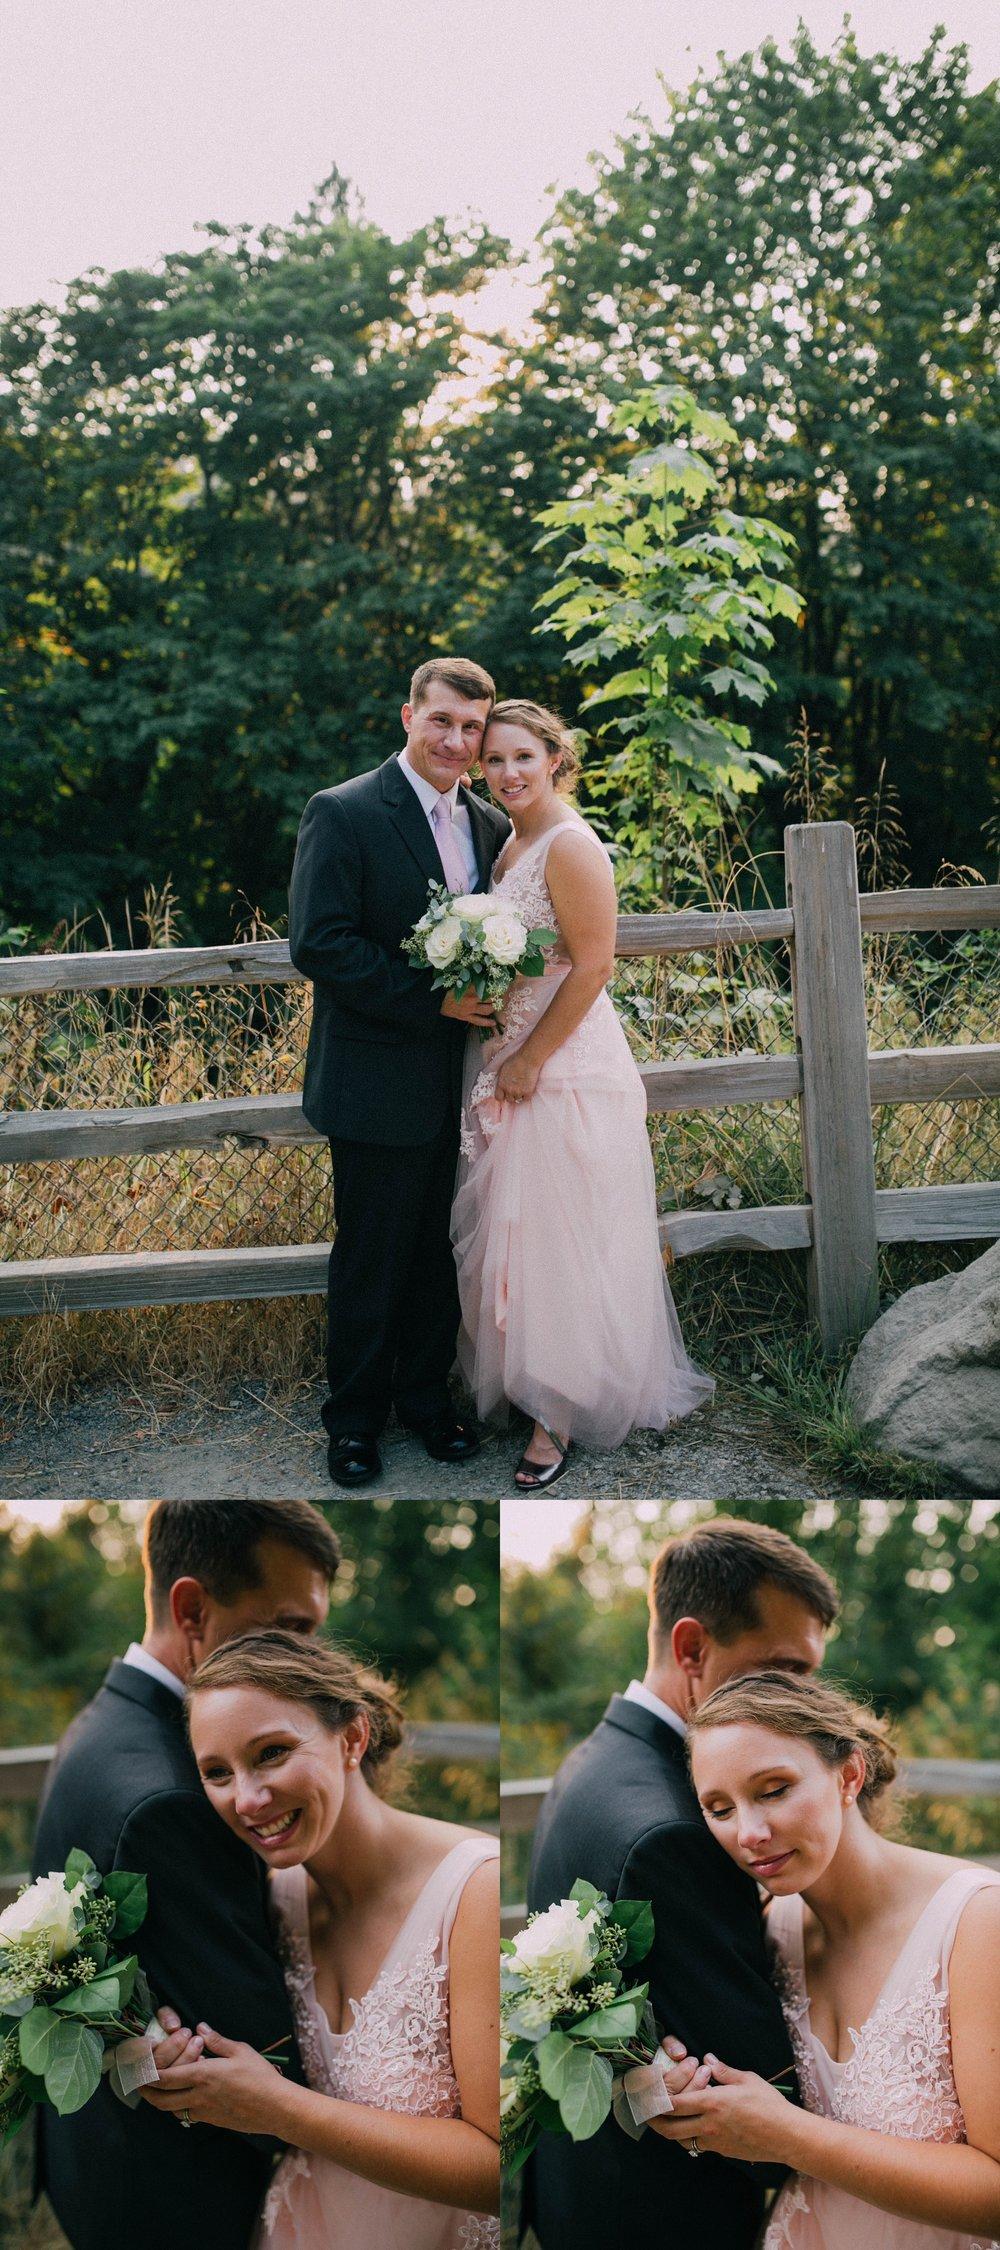 ashley_vos_seattle_ wedding_photographer_0488.jpg